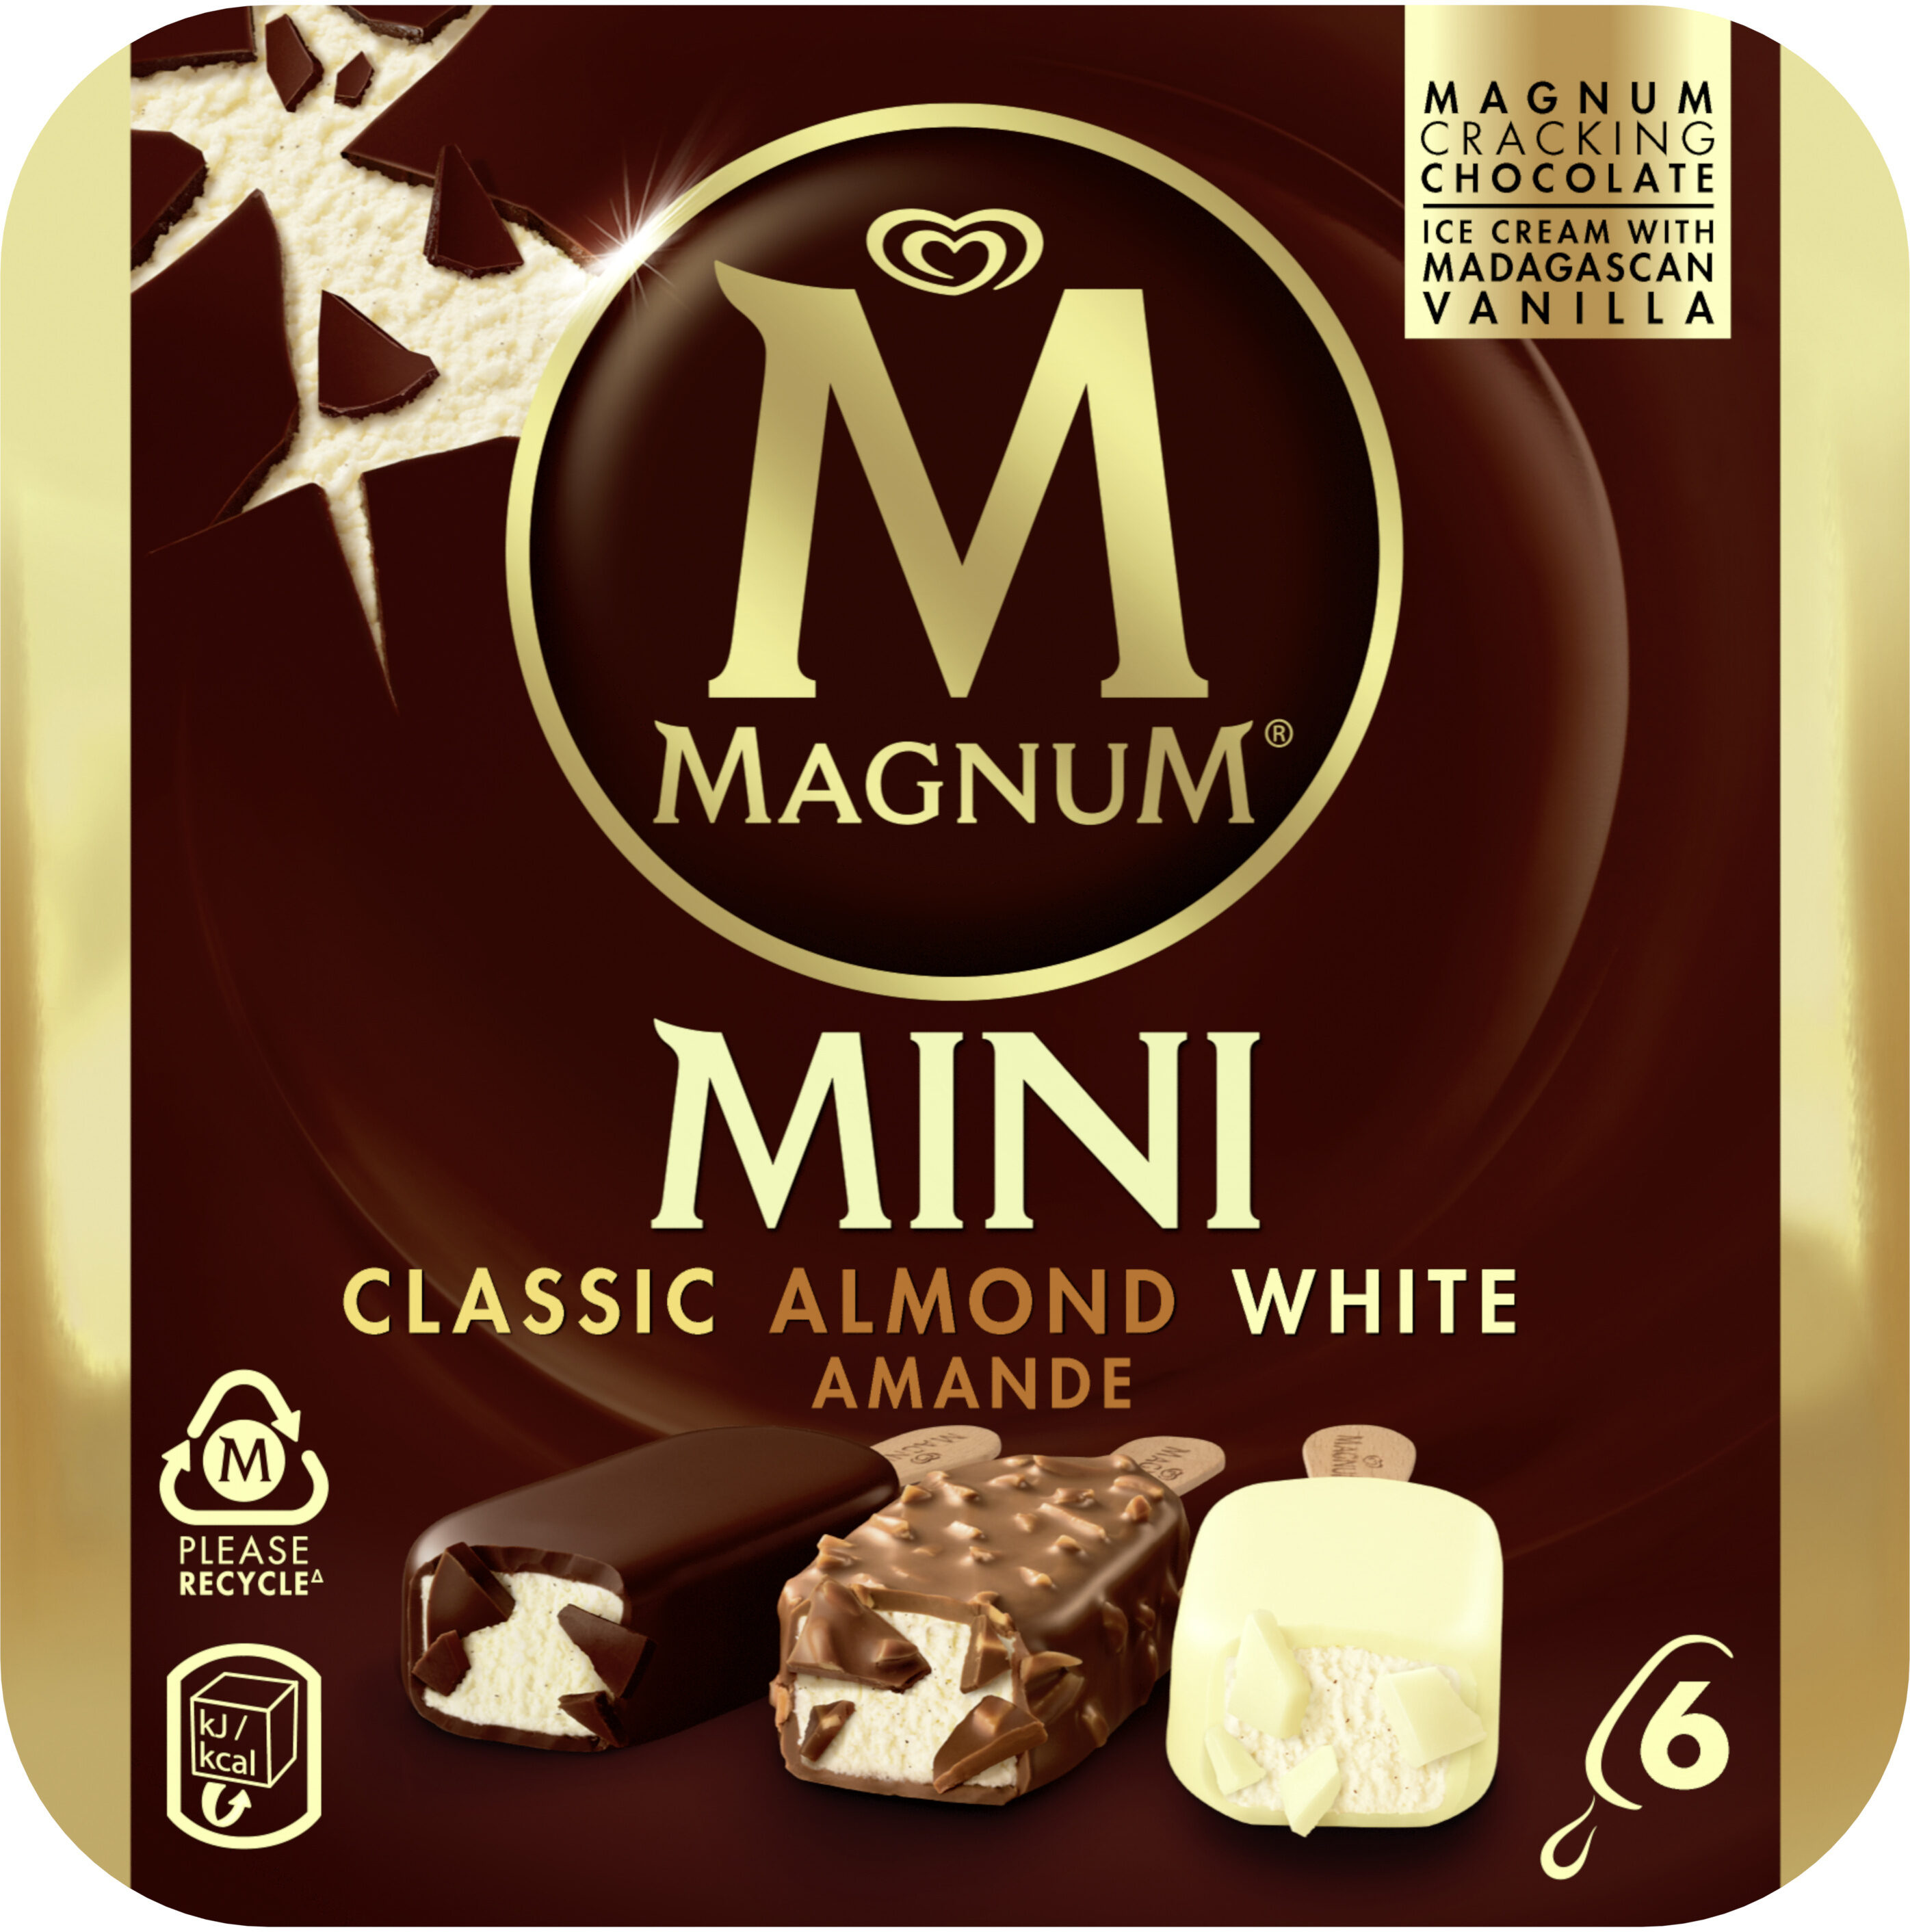 Magnum Batonnet Glace Mini Classic Amande Chocolat Blanc x 6 330 ml - Produit - fr